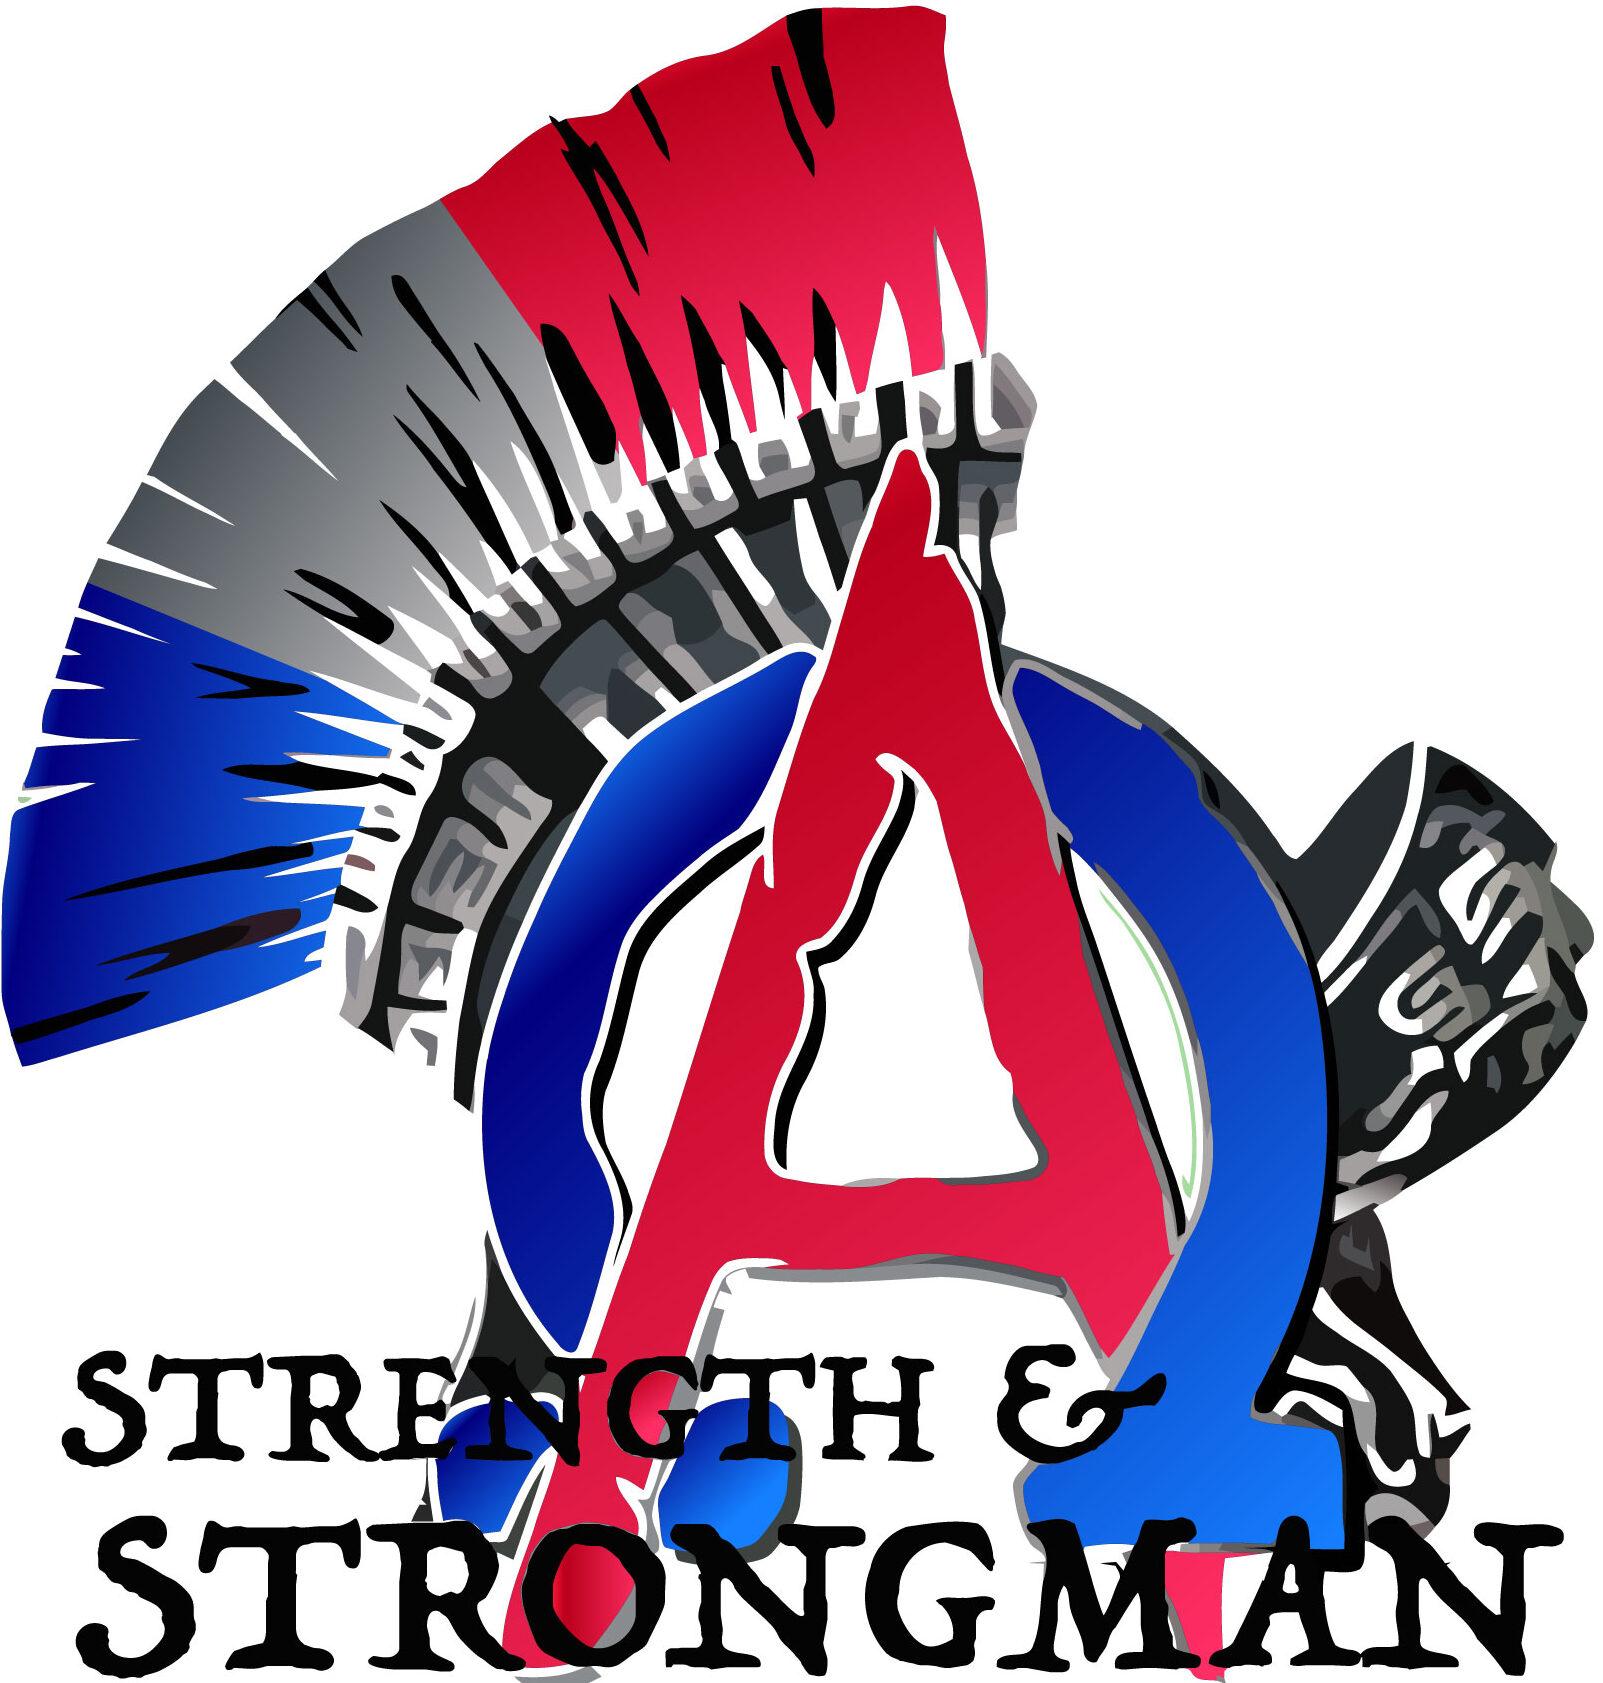 Alpha Omega Strength and Strongman